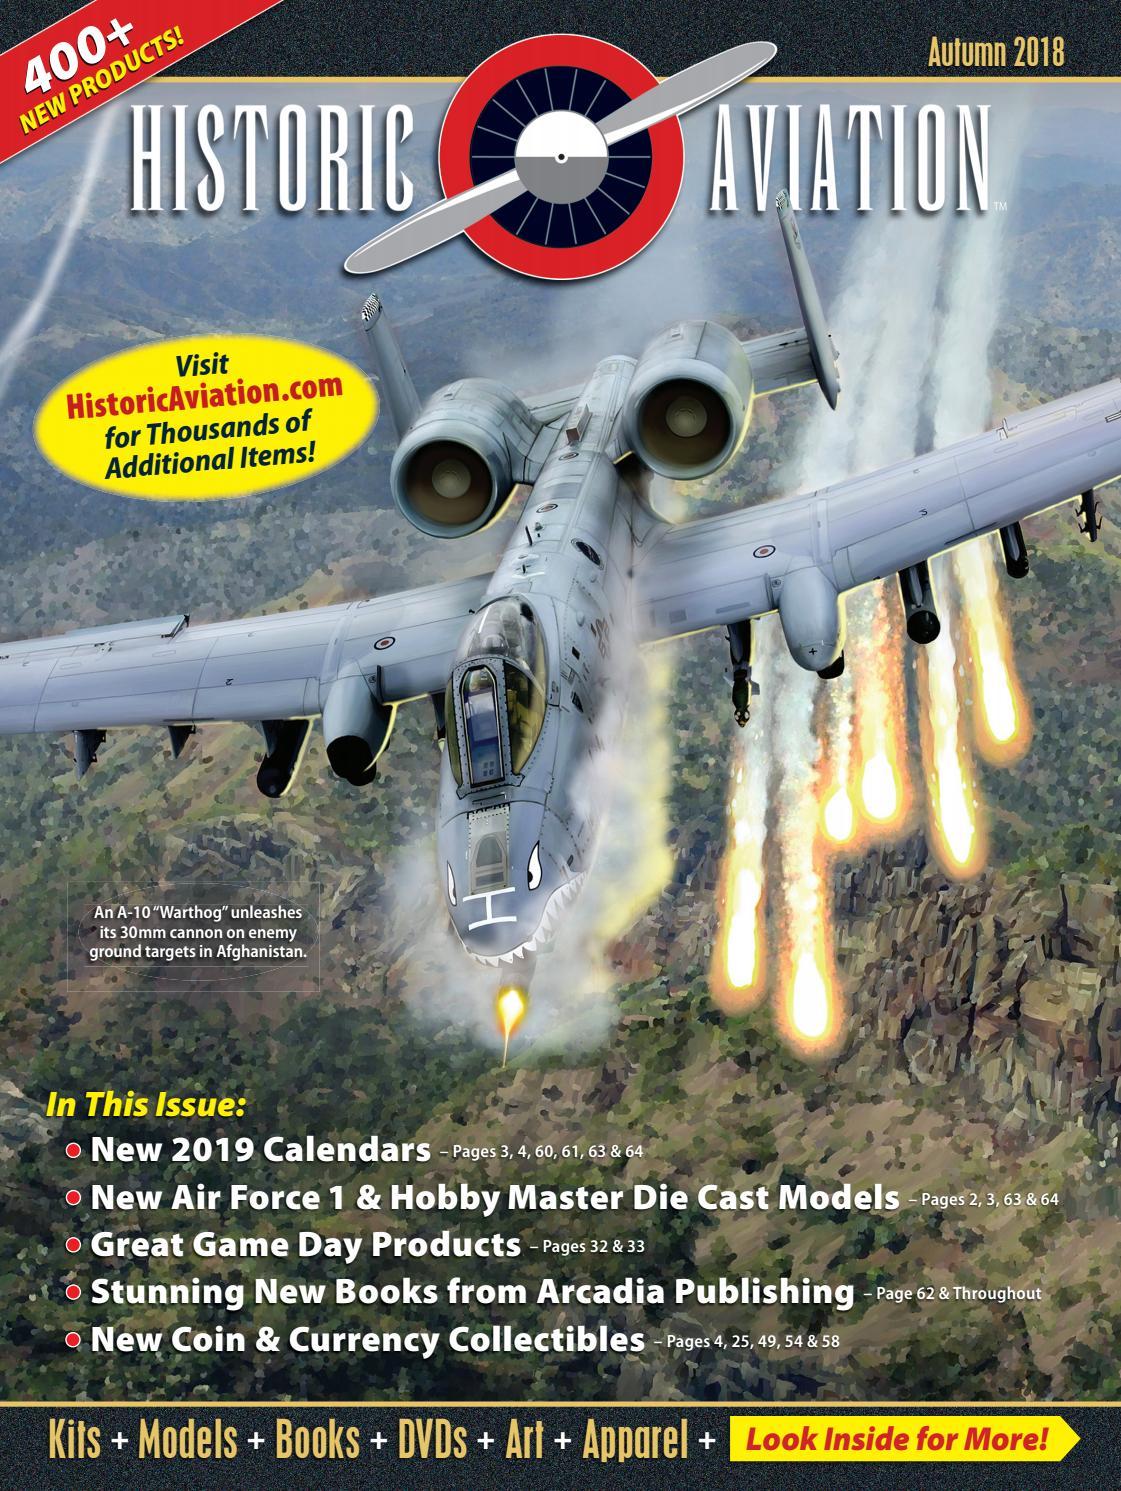 Wltk US Marine Corps V22 Osprey Tiltrotor Aircraft 1//72 Diecast Model USA SHIP